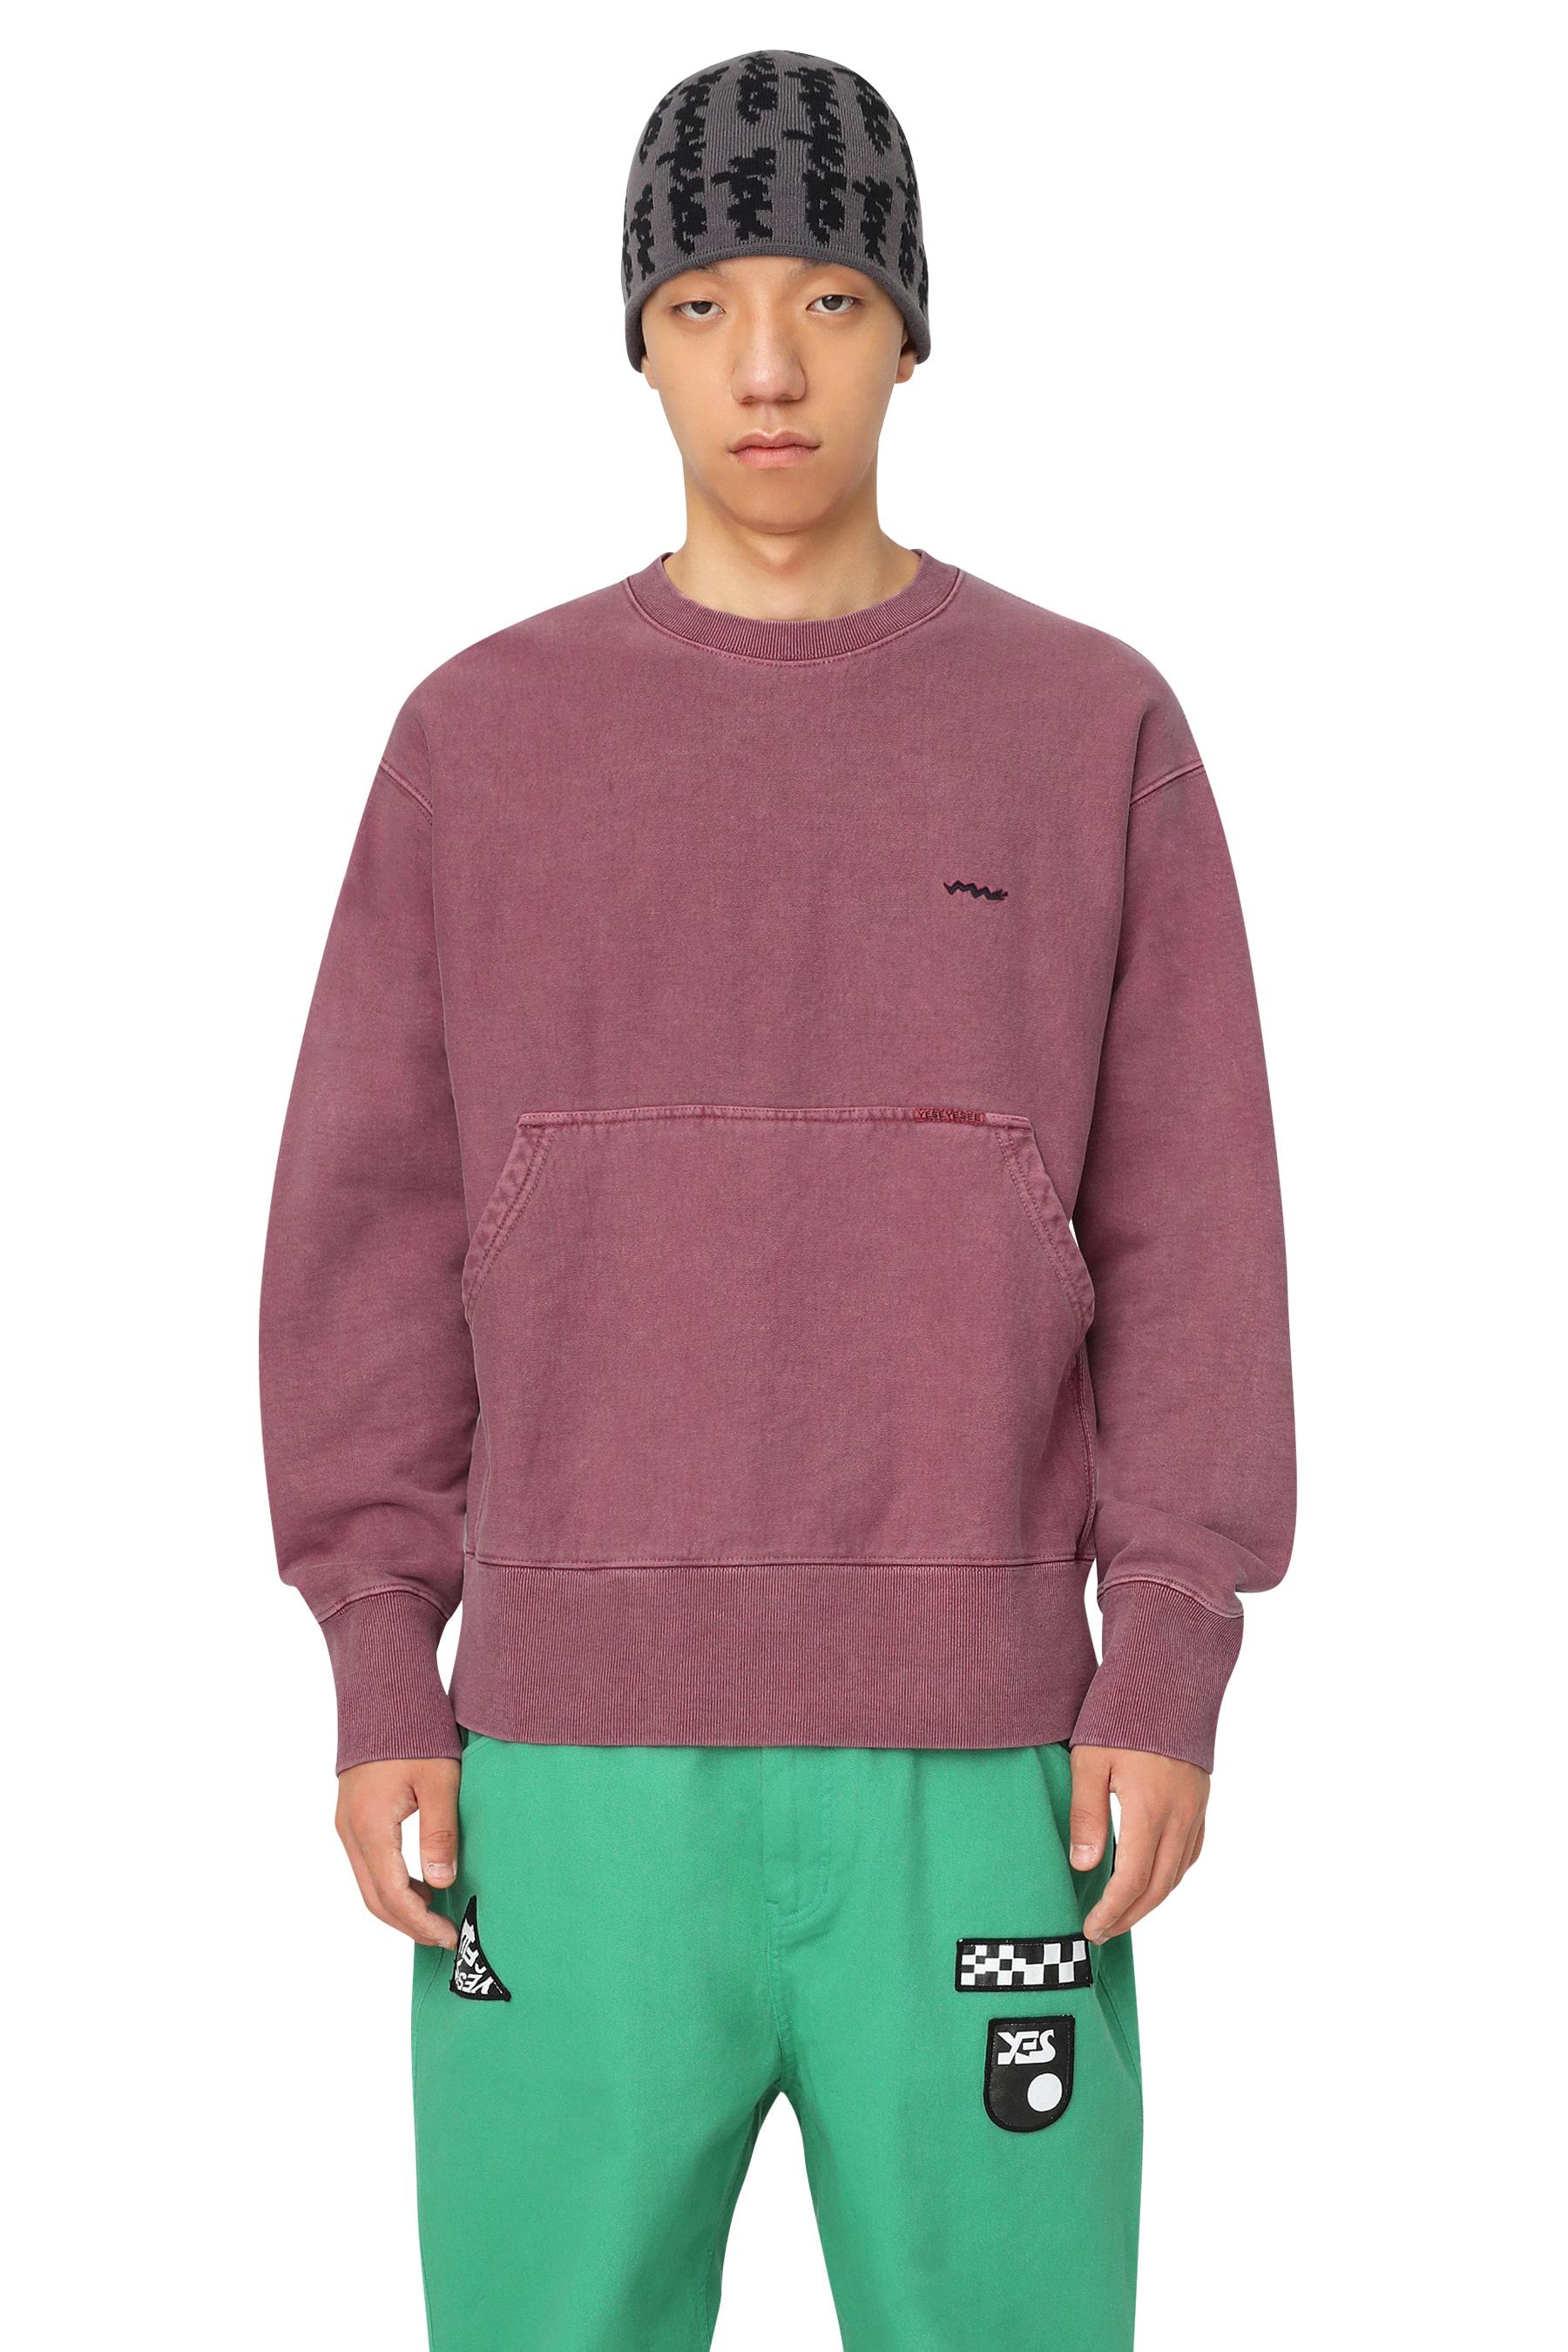 Y.E.S Pig Dyed Sweatshirts Burgundy